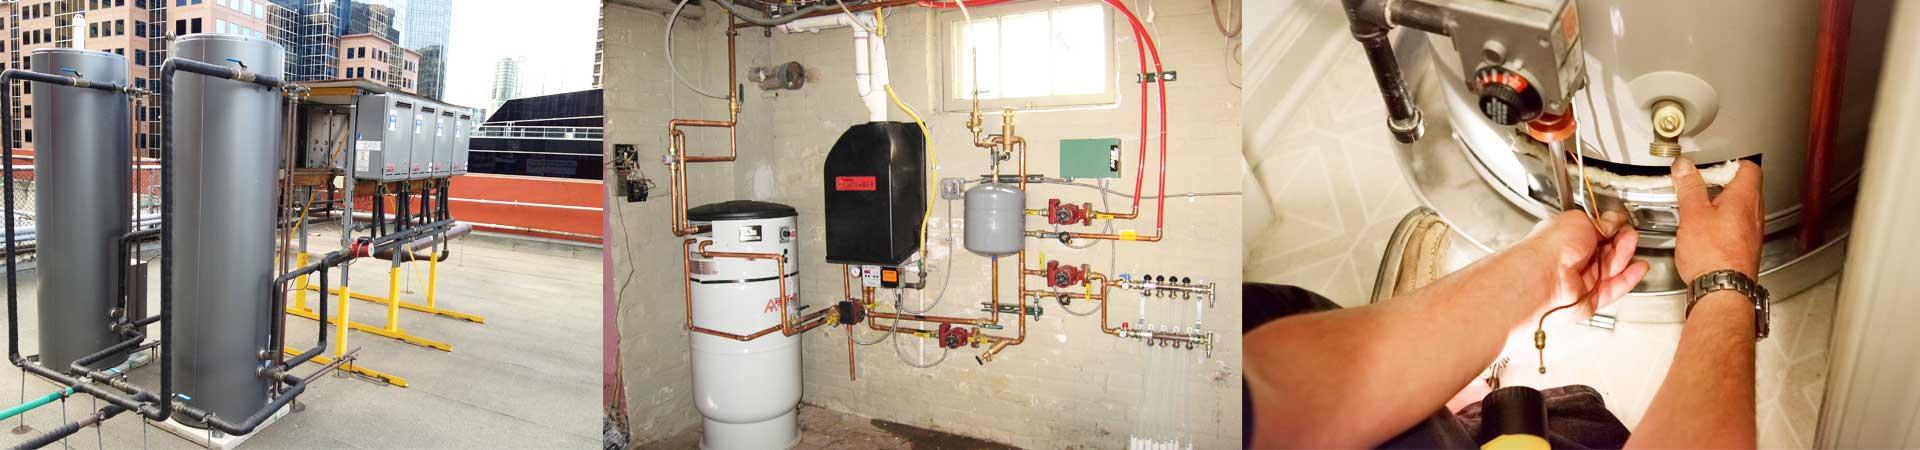 Hot Water Heating System Slider